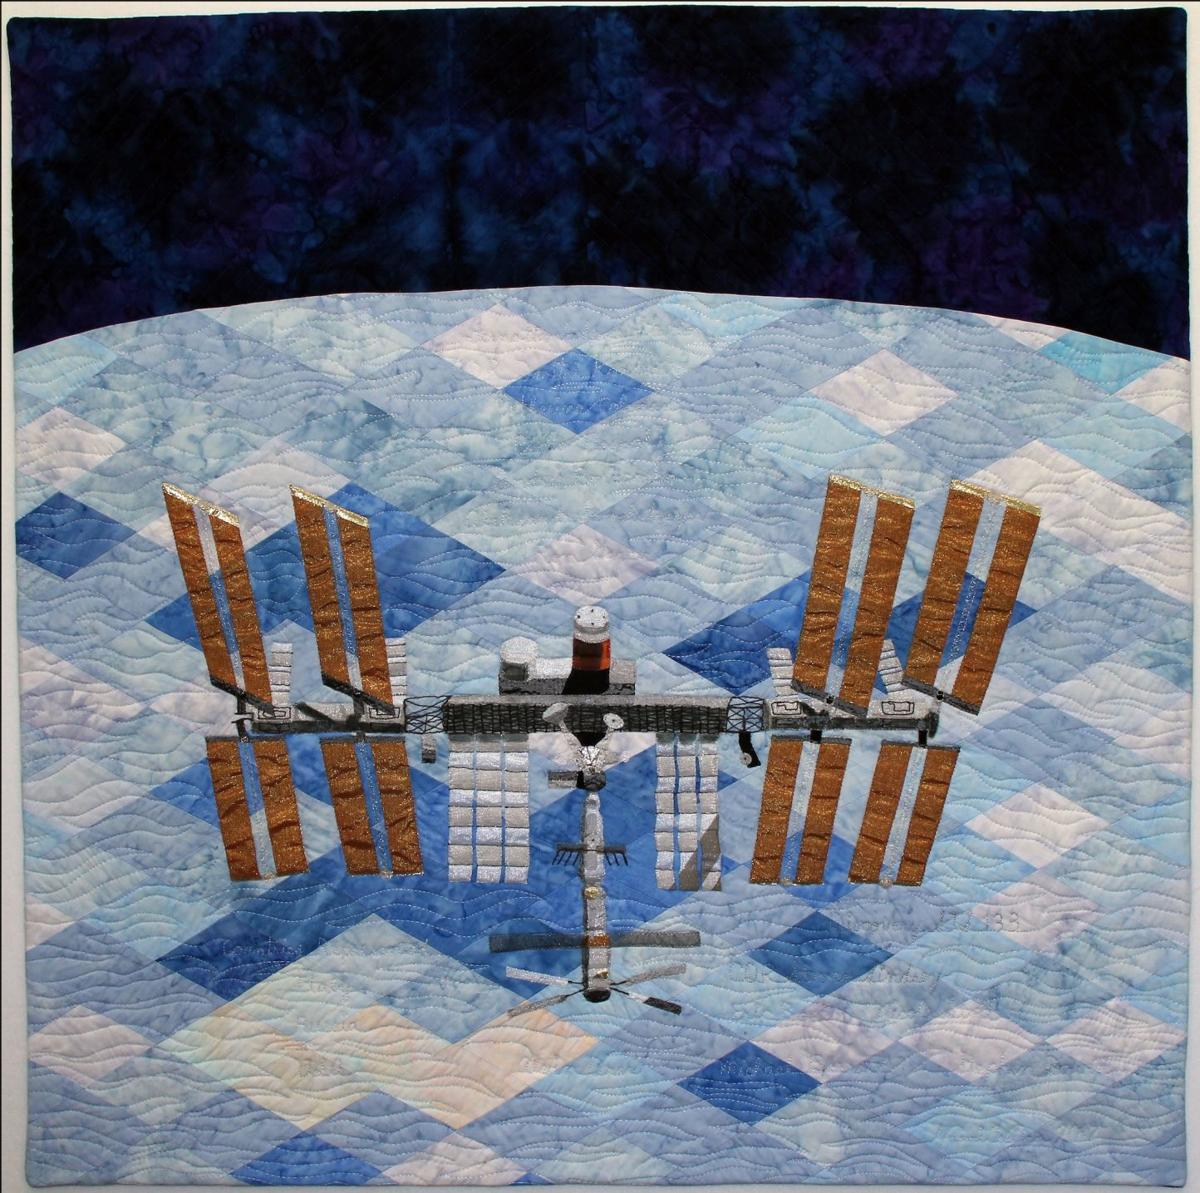 Weidner Space Station